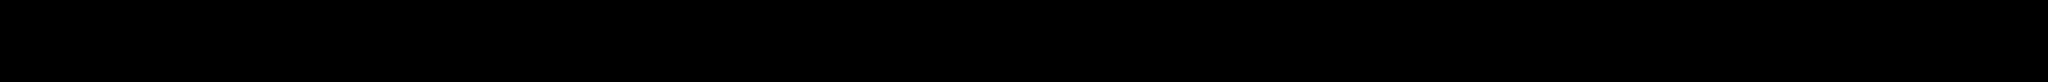 HERTH+BUSS ELPARTS Hula-Blitz D Waarschuwingslamp